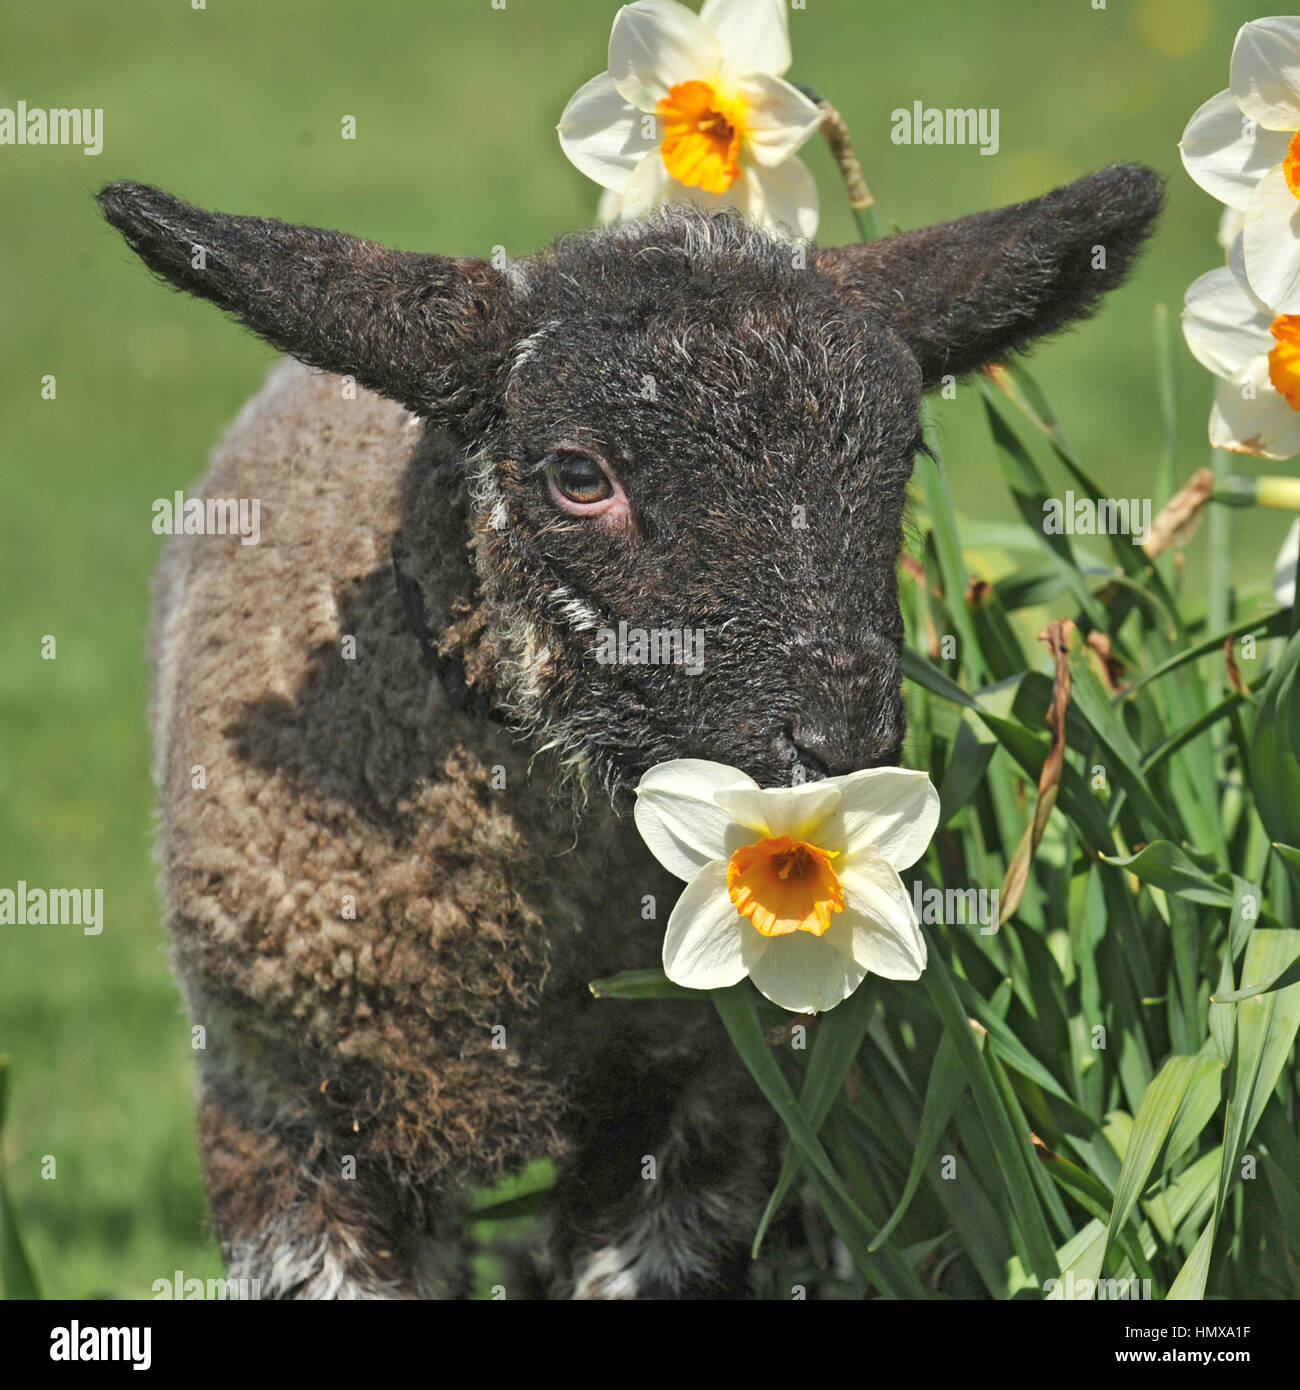 scottish blackface ram - Stock Image